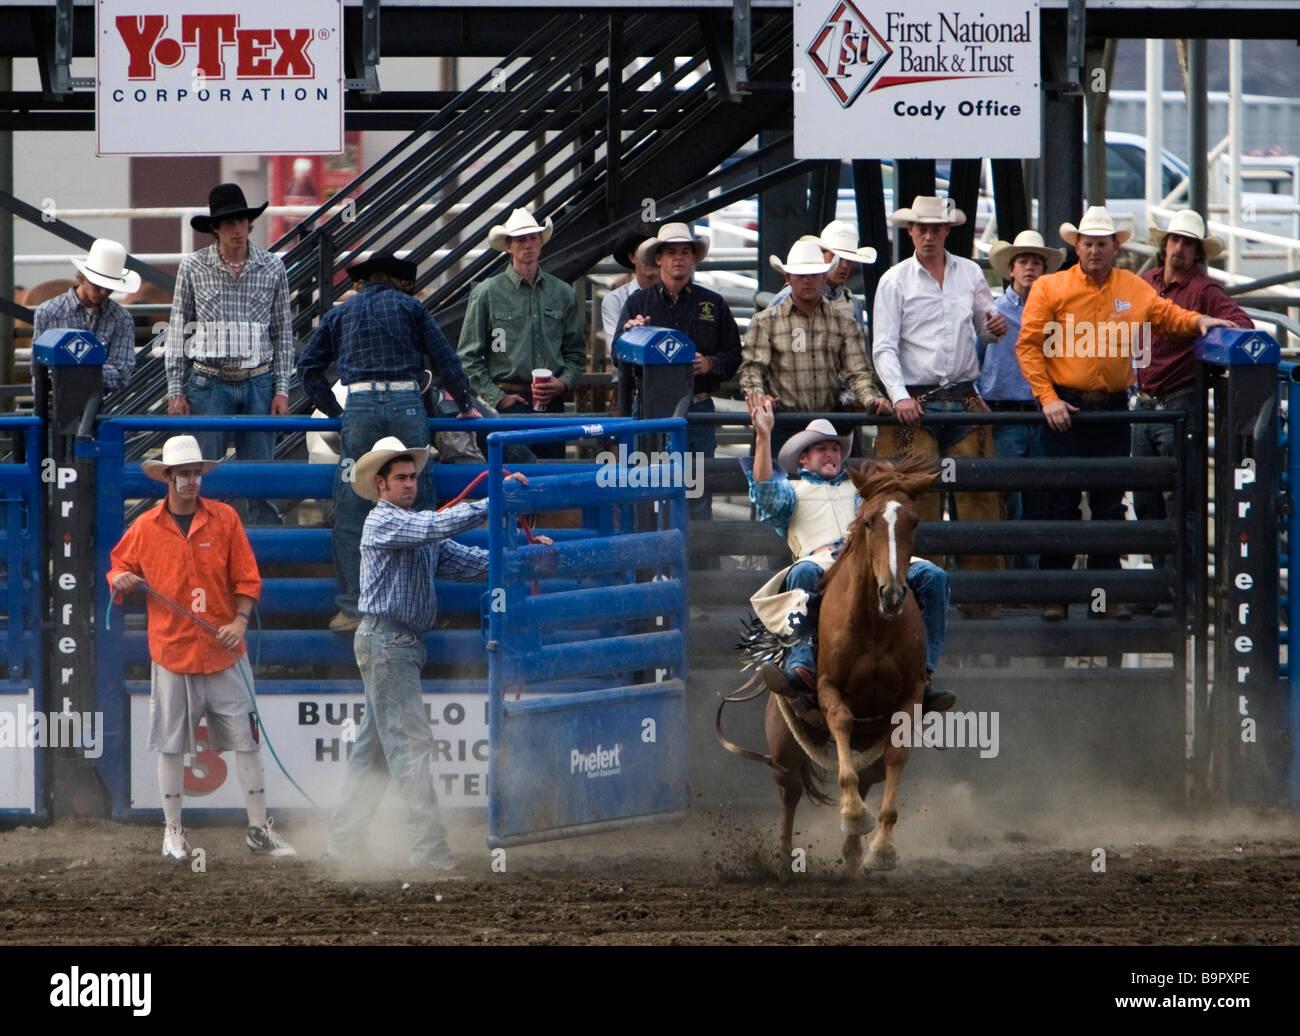 Cowboy rides bronco bucking from chute Cody Nite Rodeo Wyoming USA - Stock Image